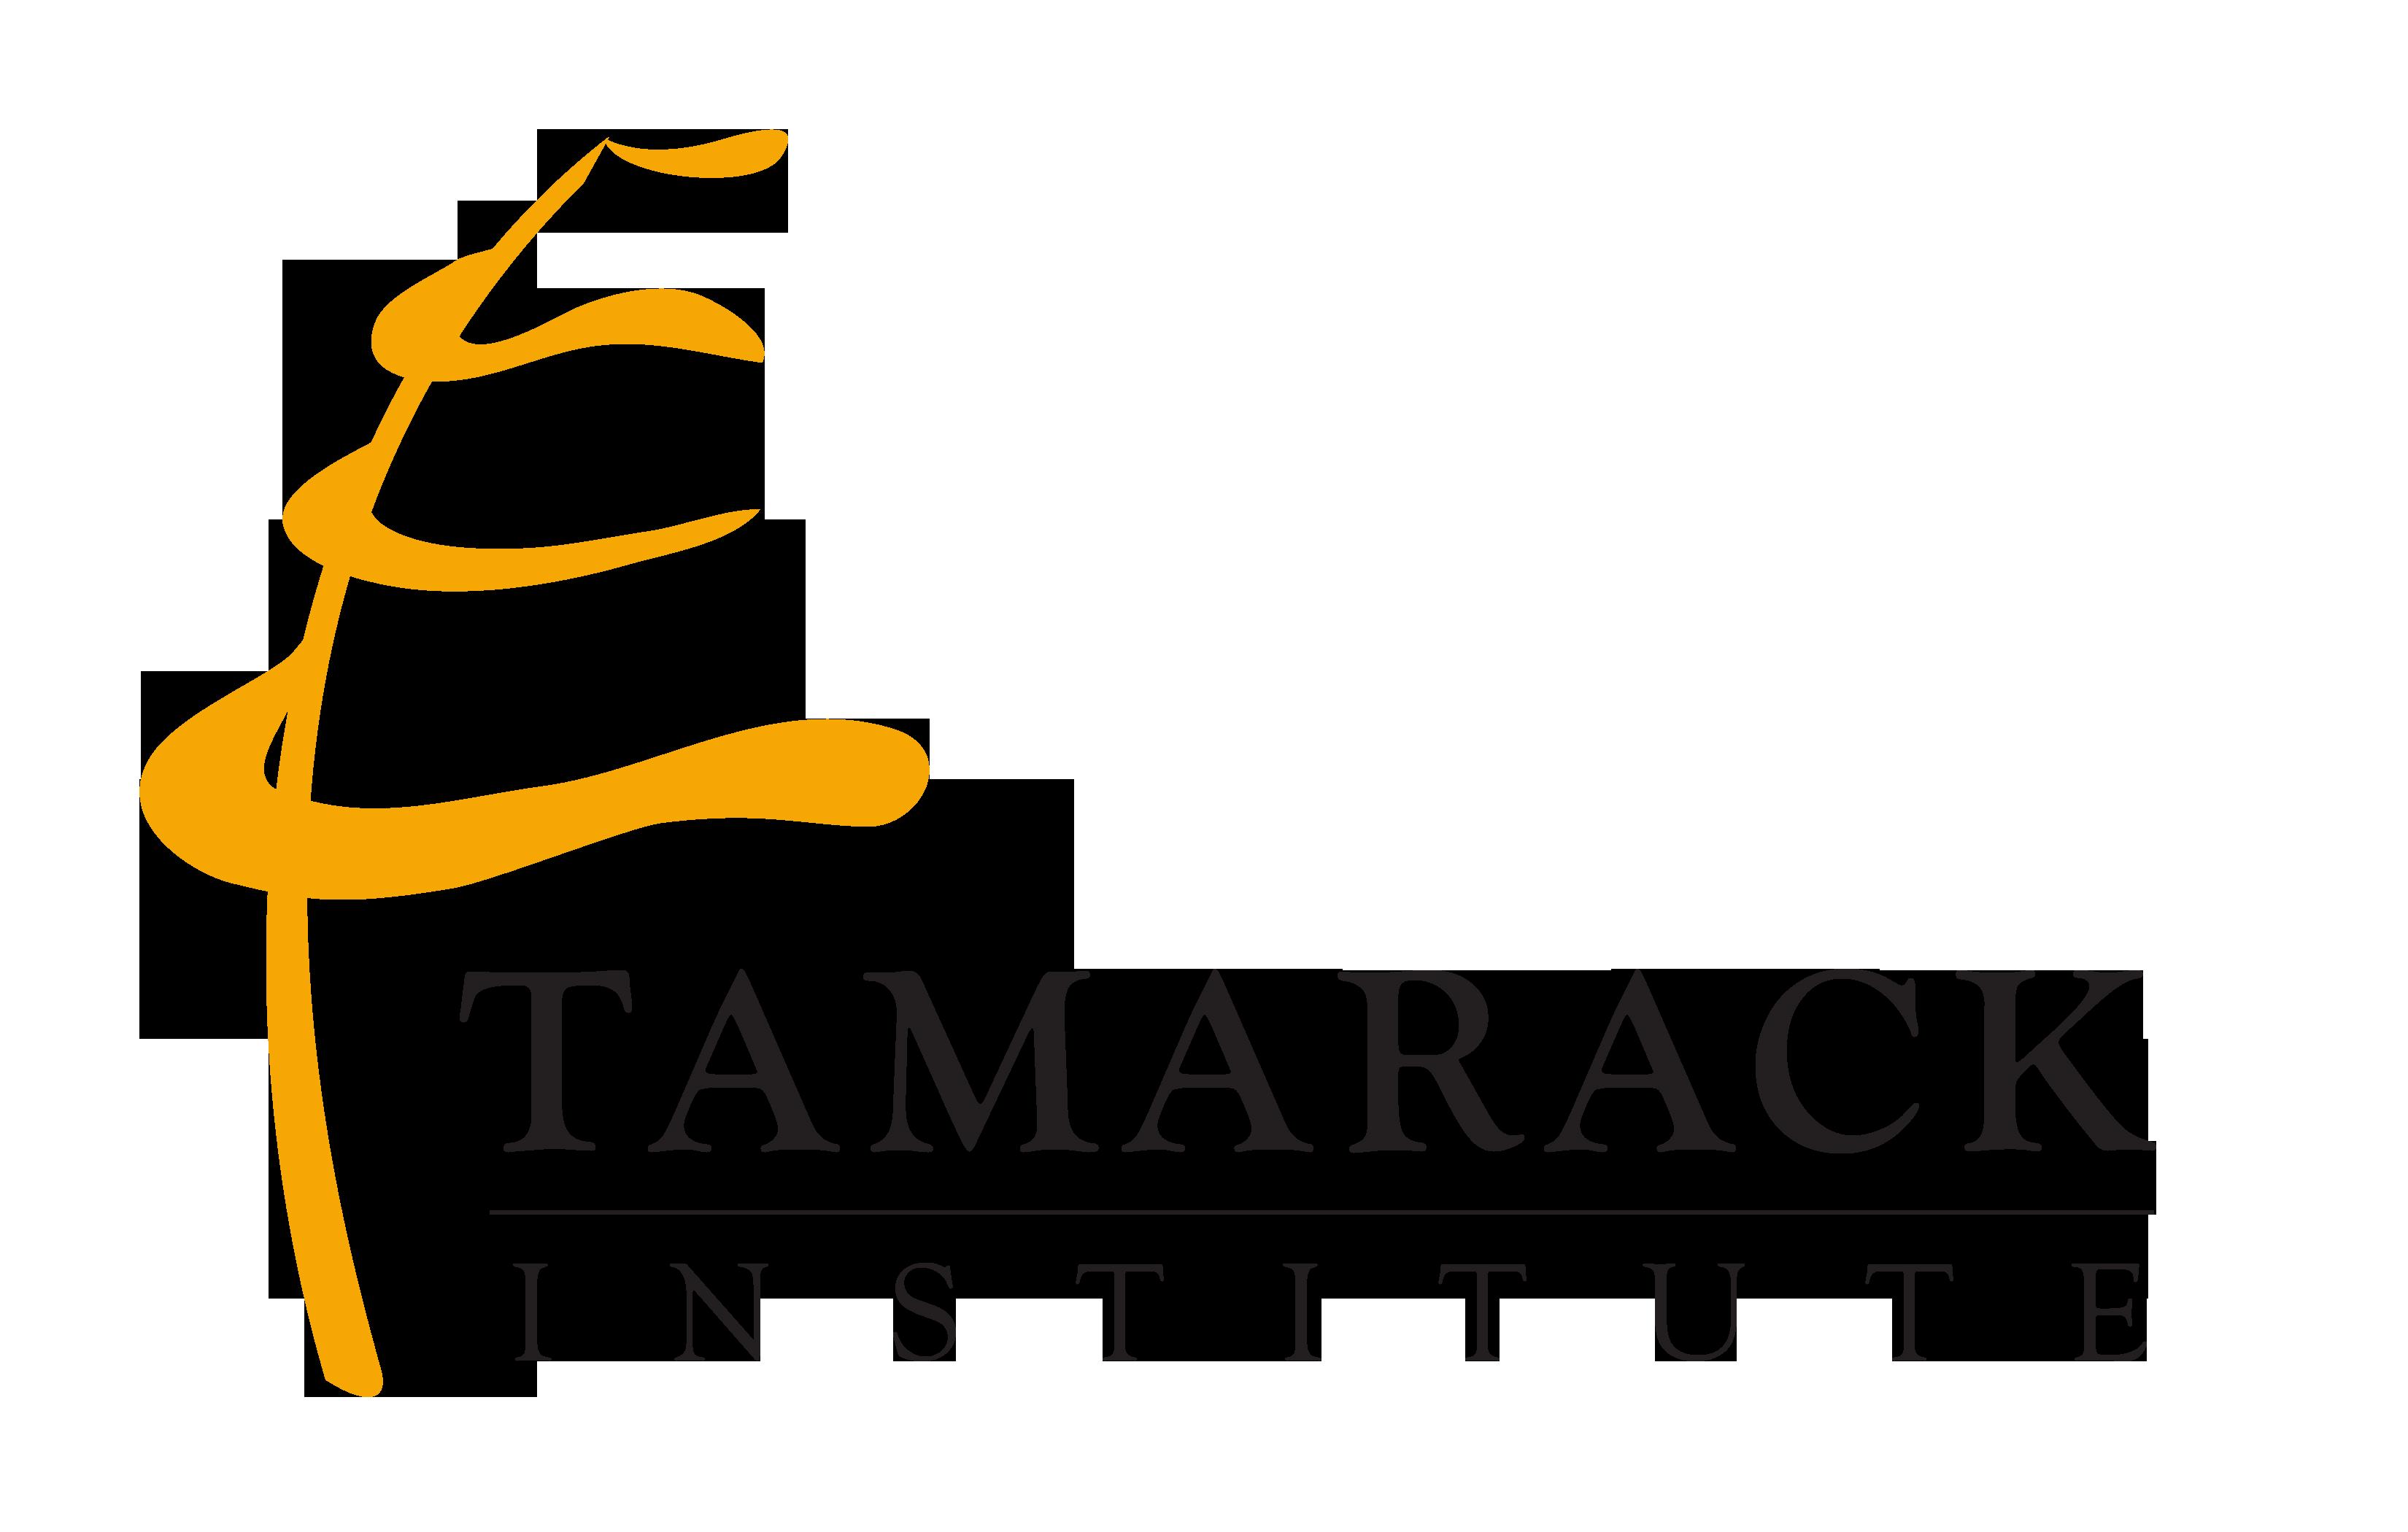 Tamarack_Logo_Transparent01.png